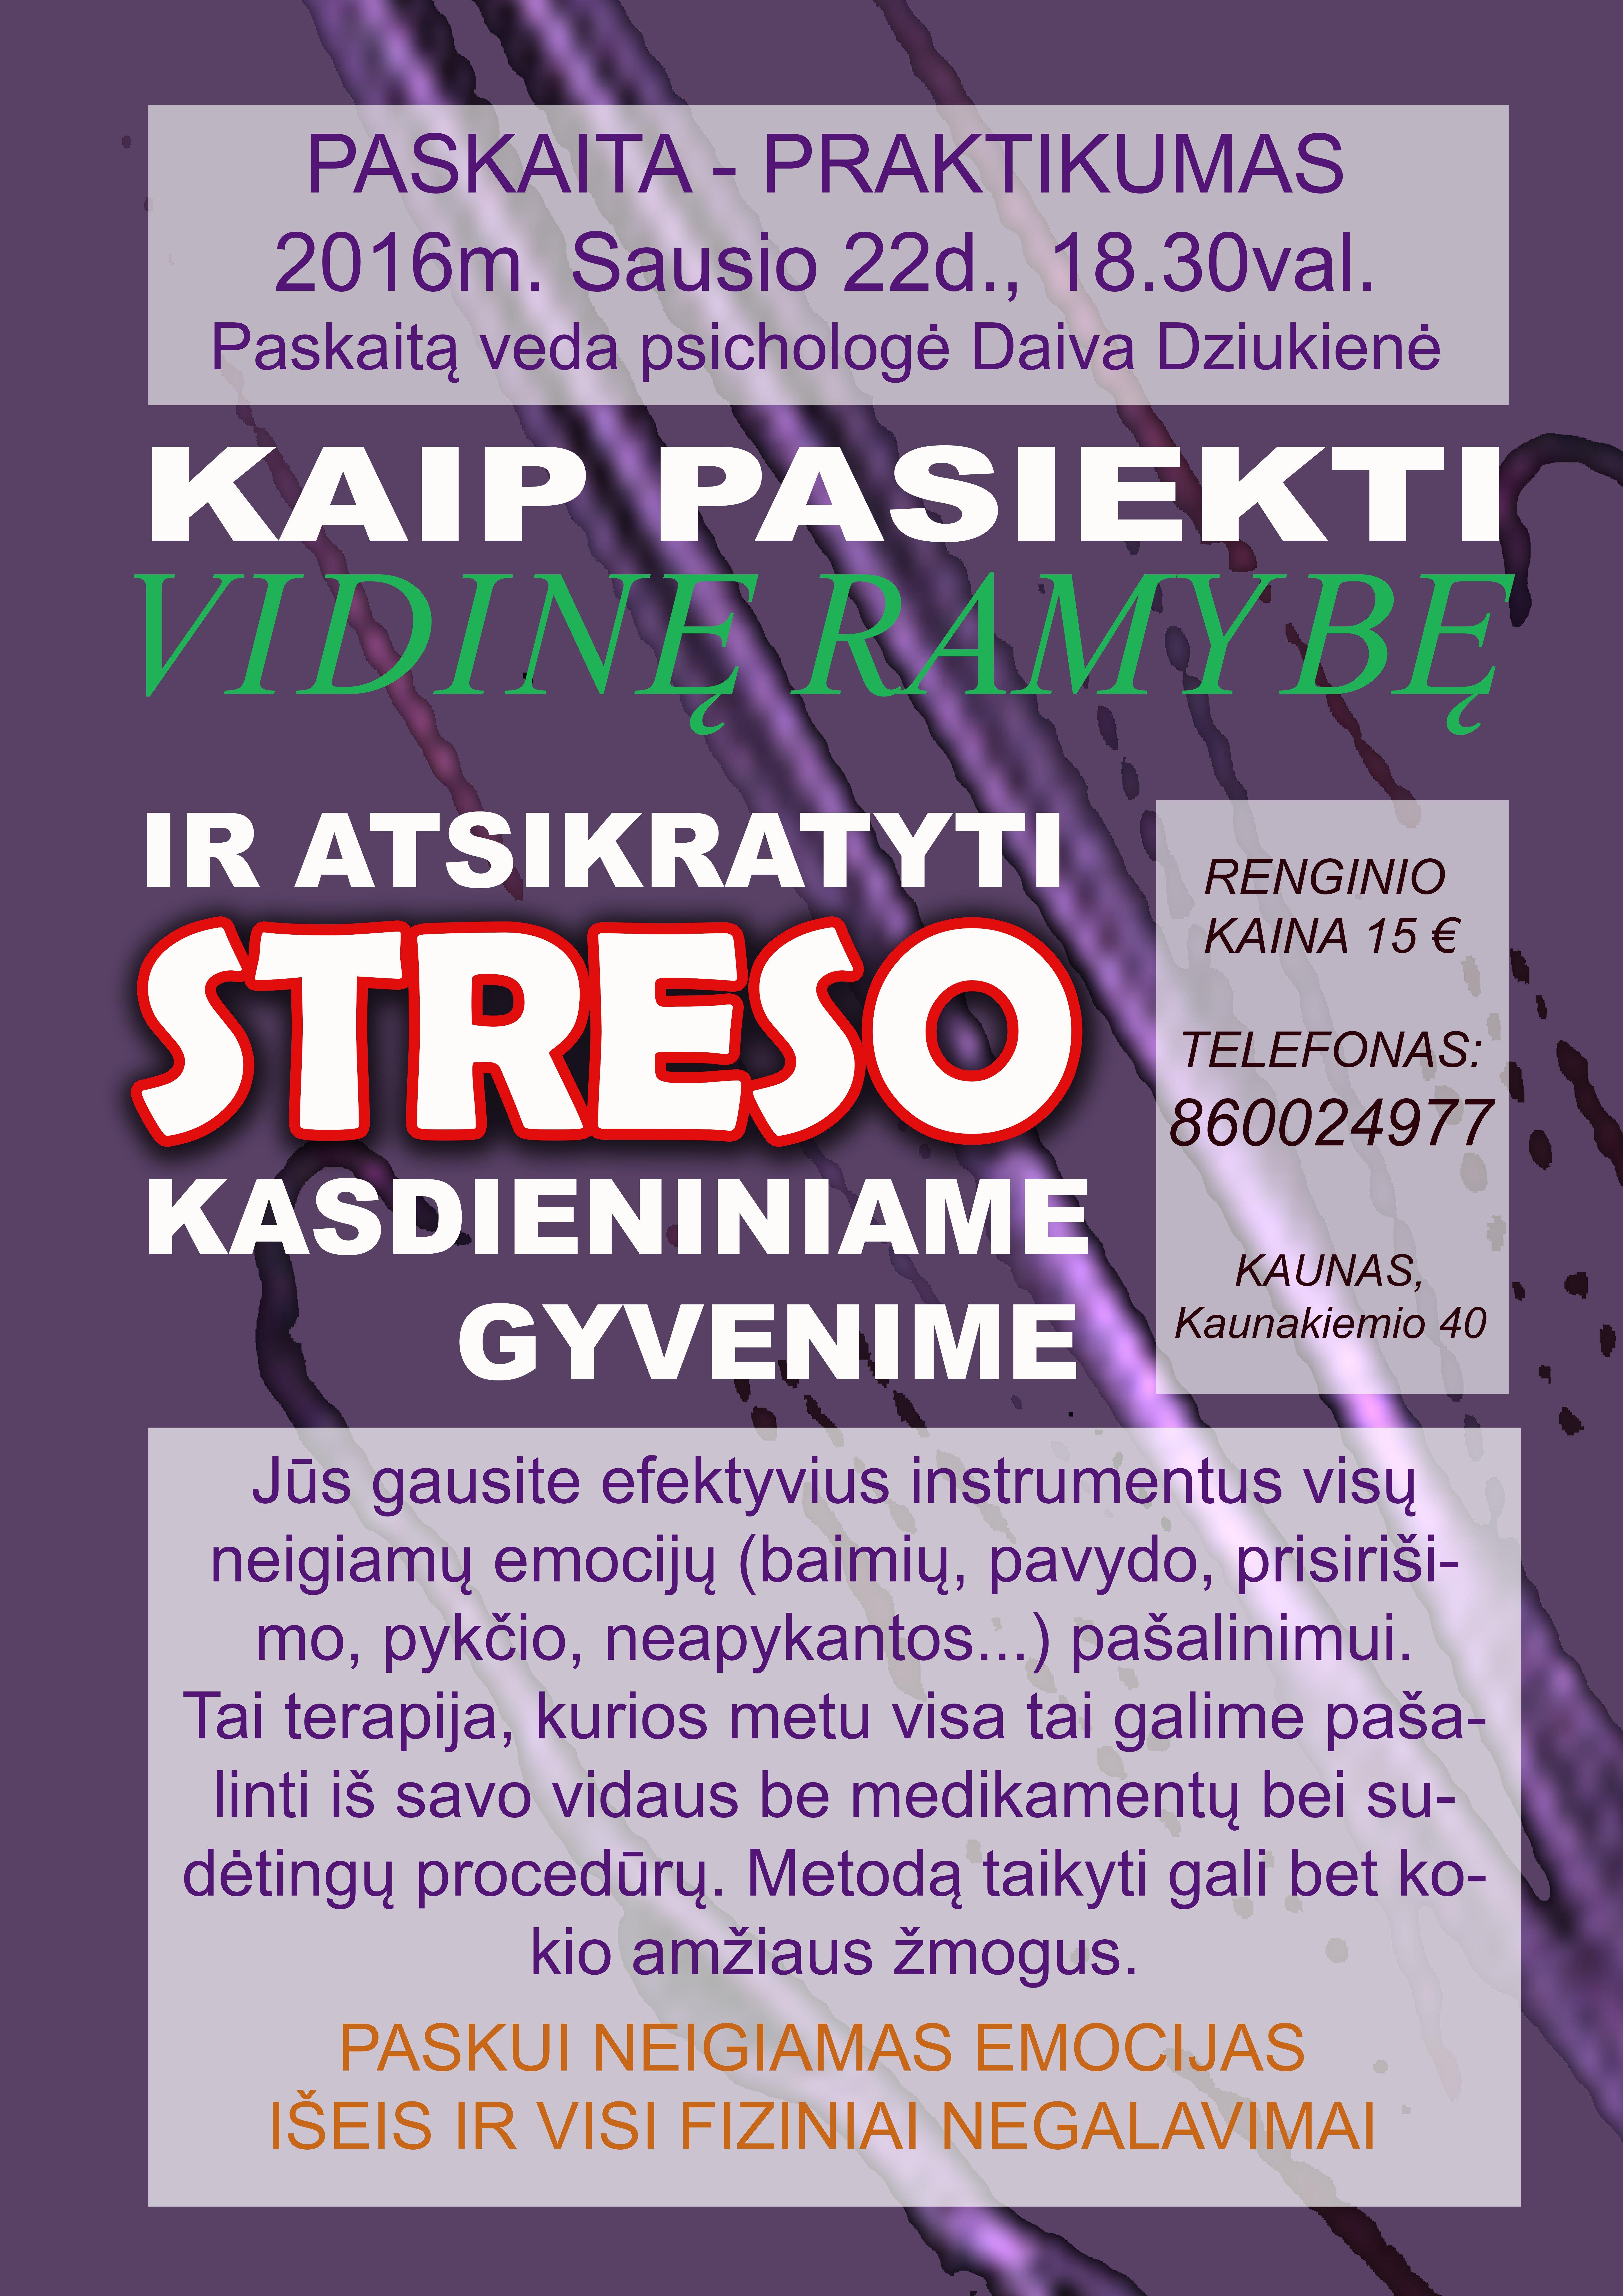 Kaunas,Kaunakiemio g. 40